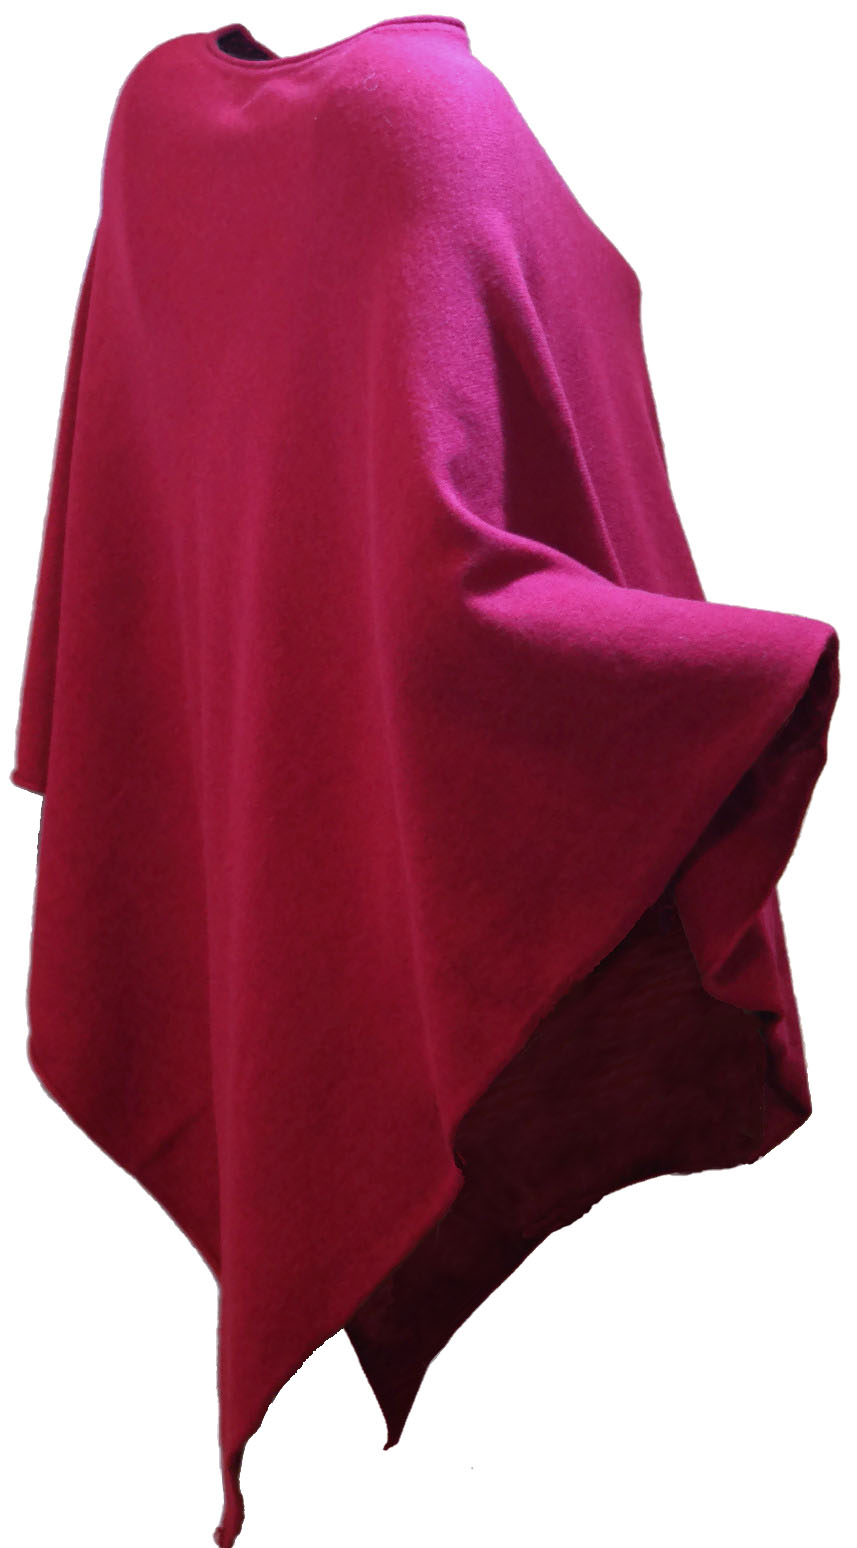 poncho-red-back-side-dsc00378-copy.jpg